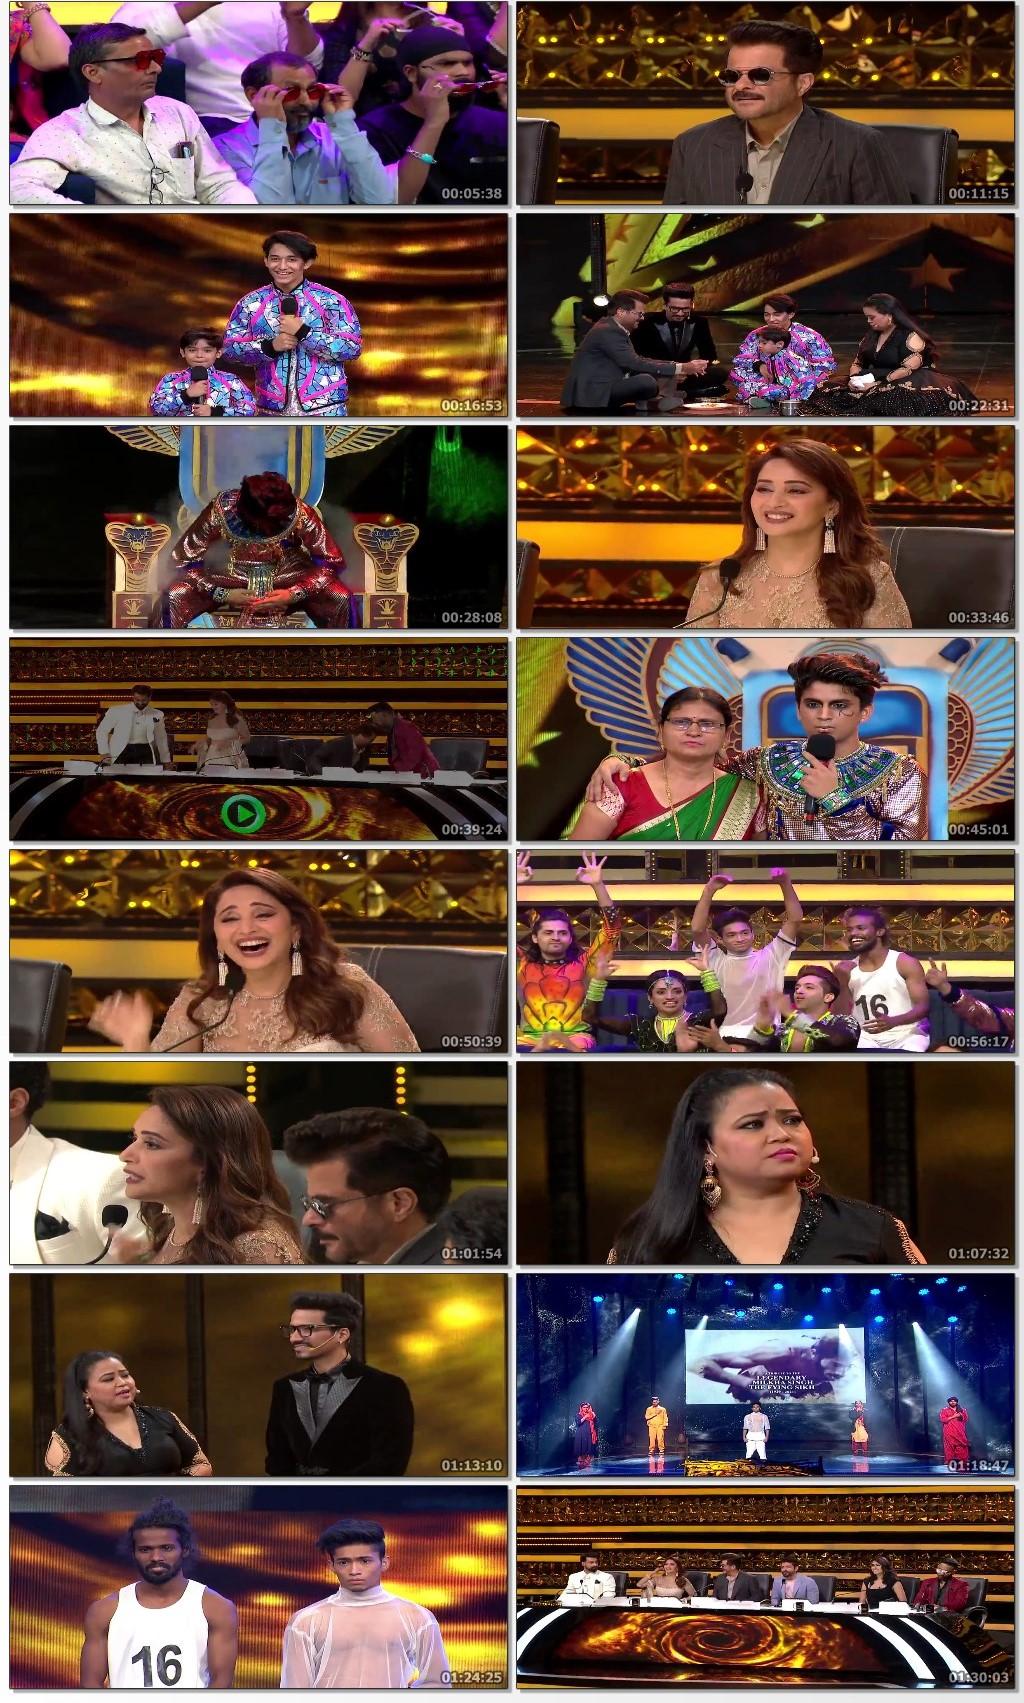 Dance-Deewane-S03-10-July-2021-school-Hindi-720p-HDRip-660-MB-mkv-thumbsa4f7ec3b20015a5b